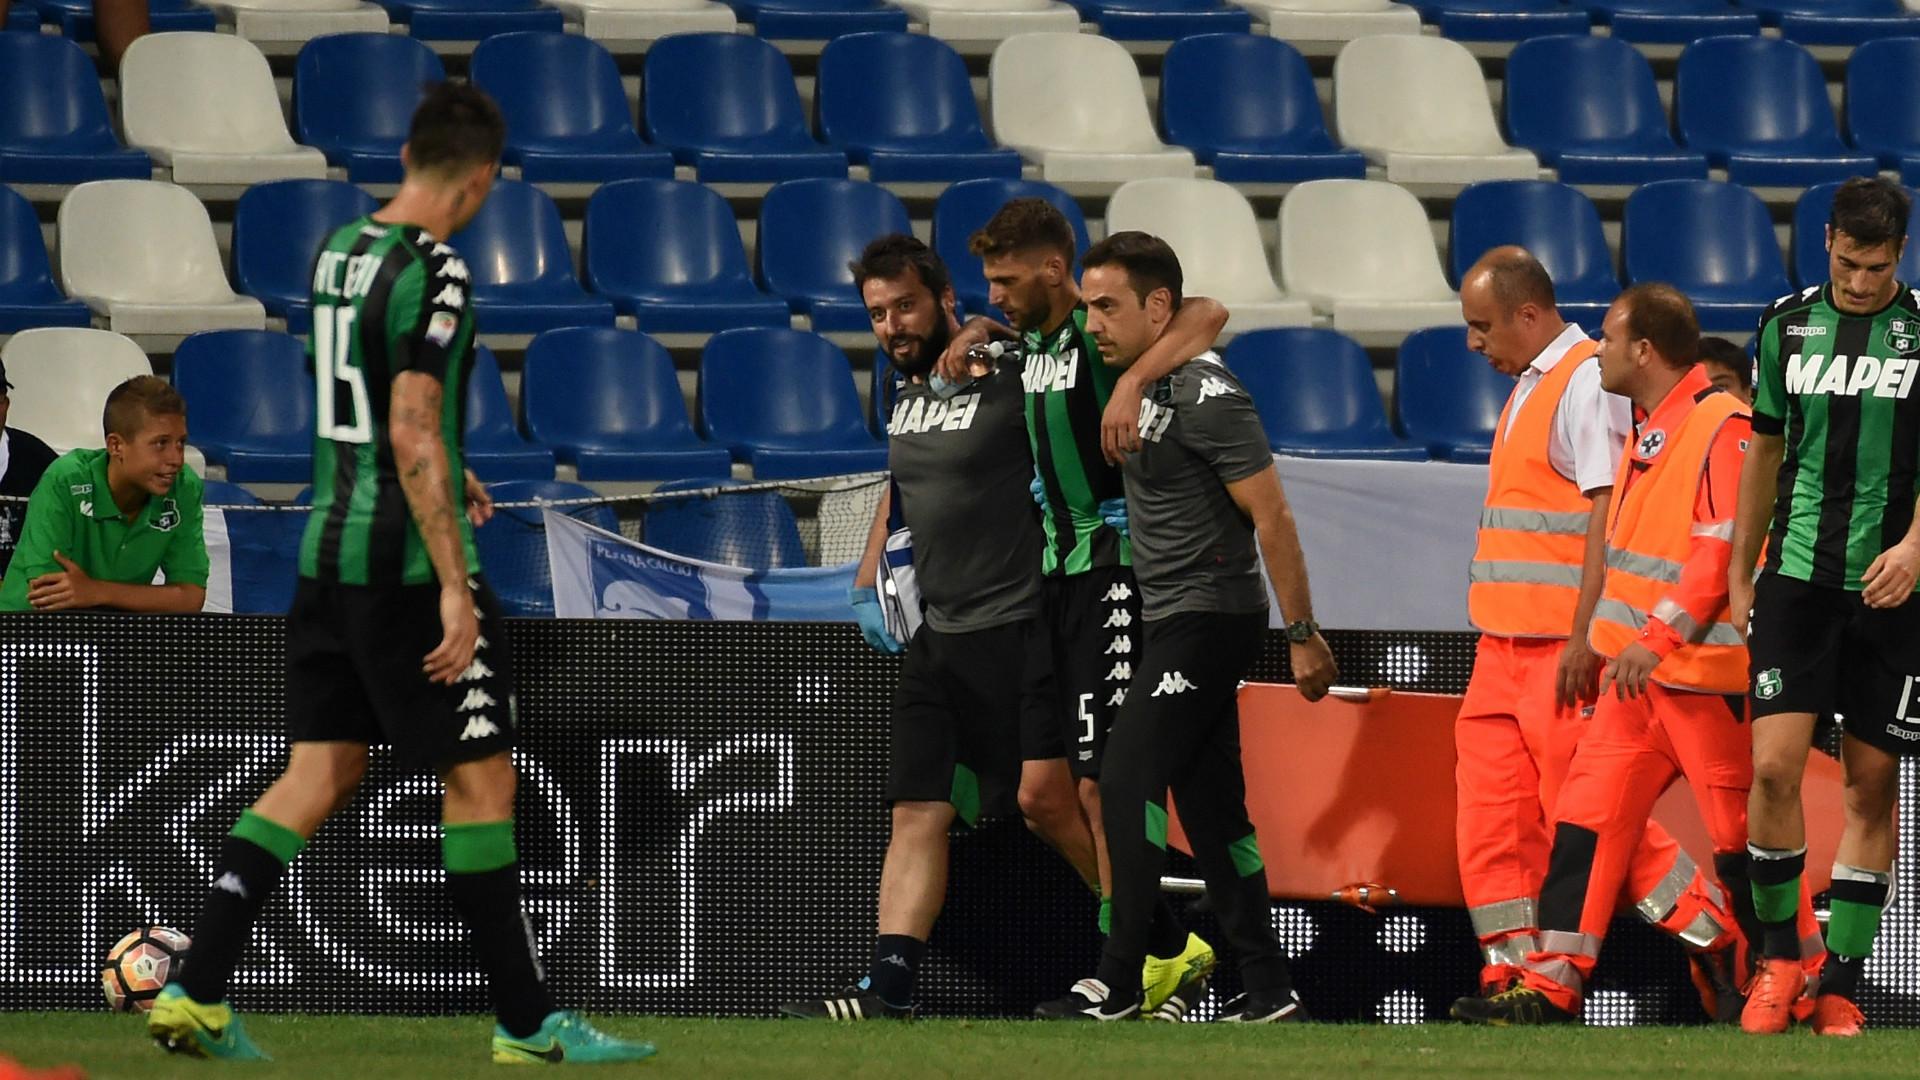 Fantacalcio: Tegola Berardi, salta la Juventus